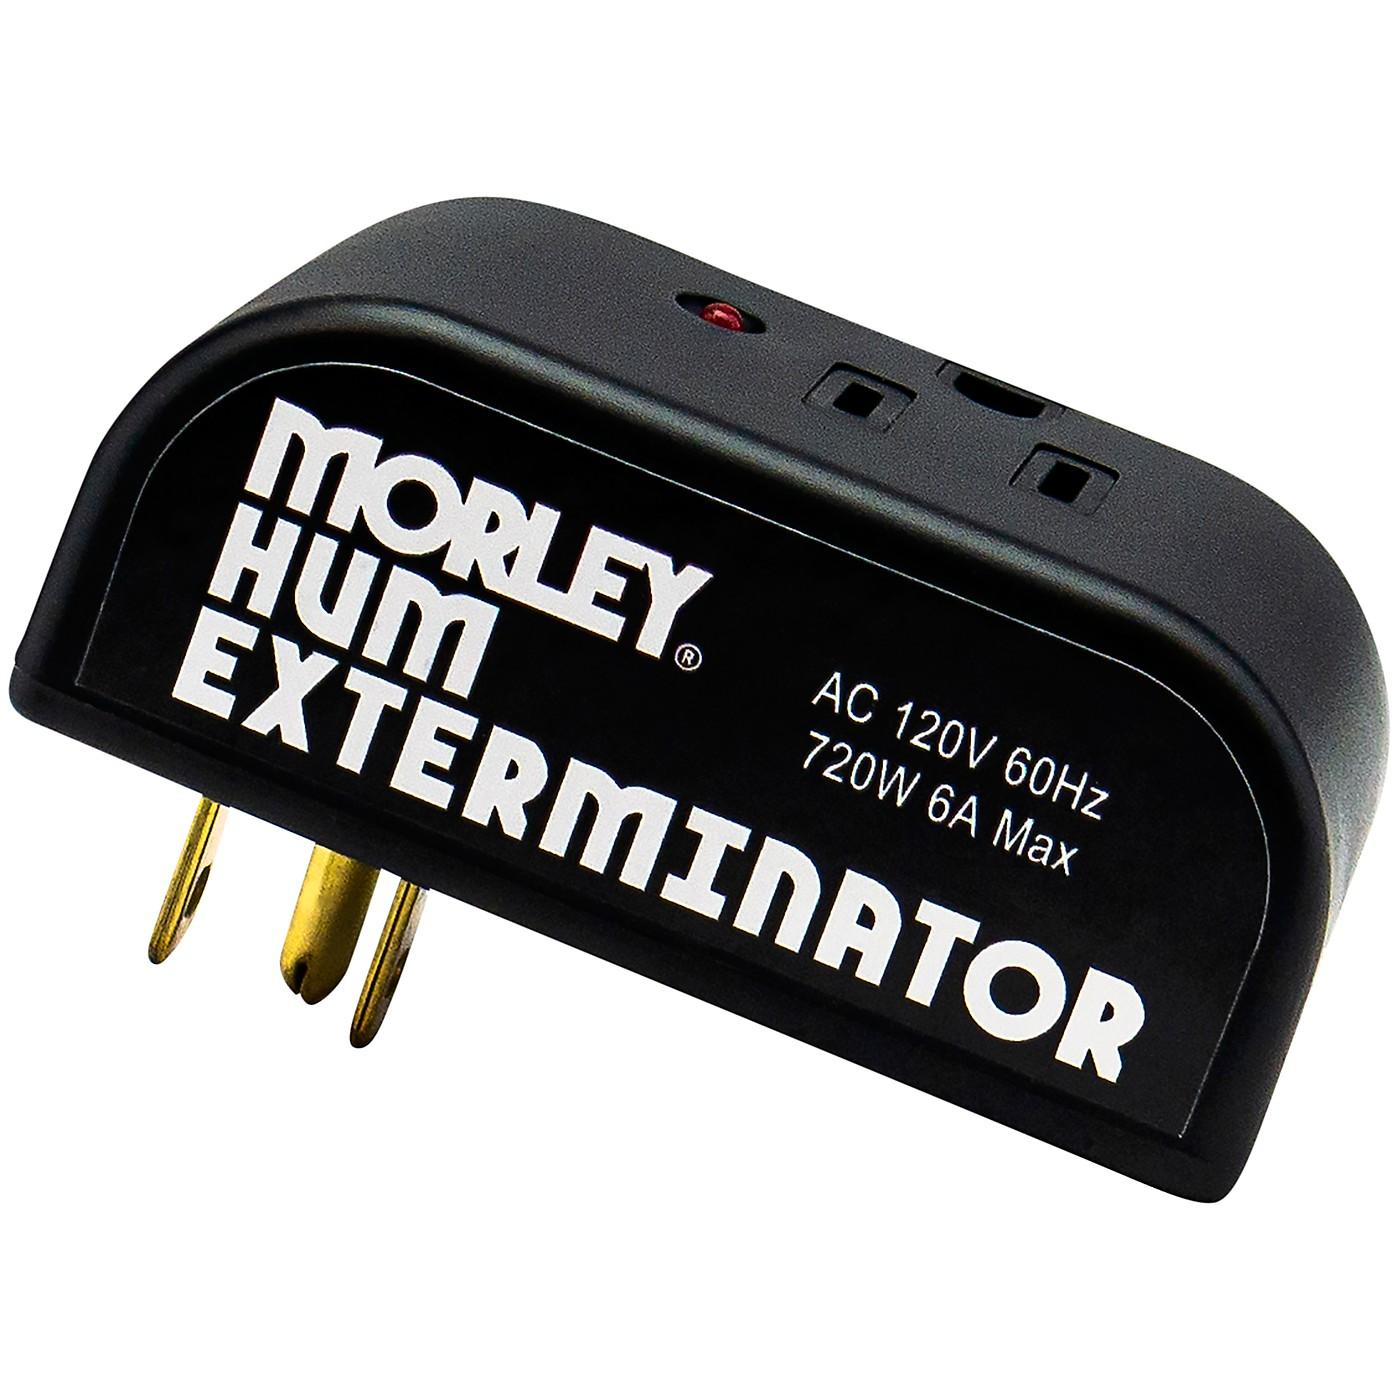 Morley Hum Exterminator thumbnail